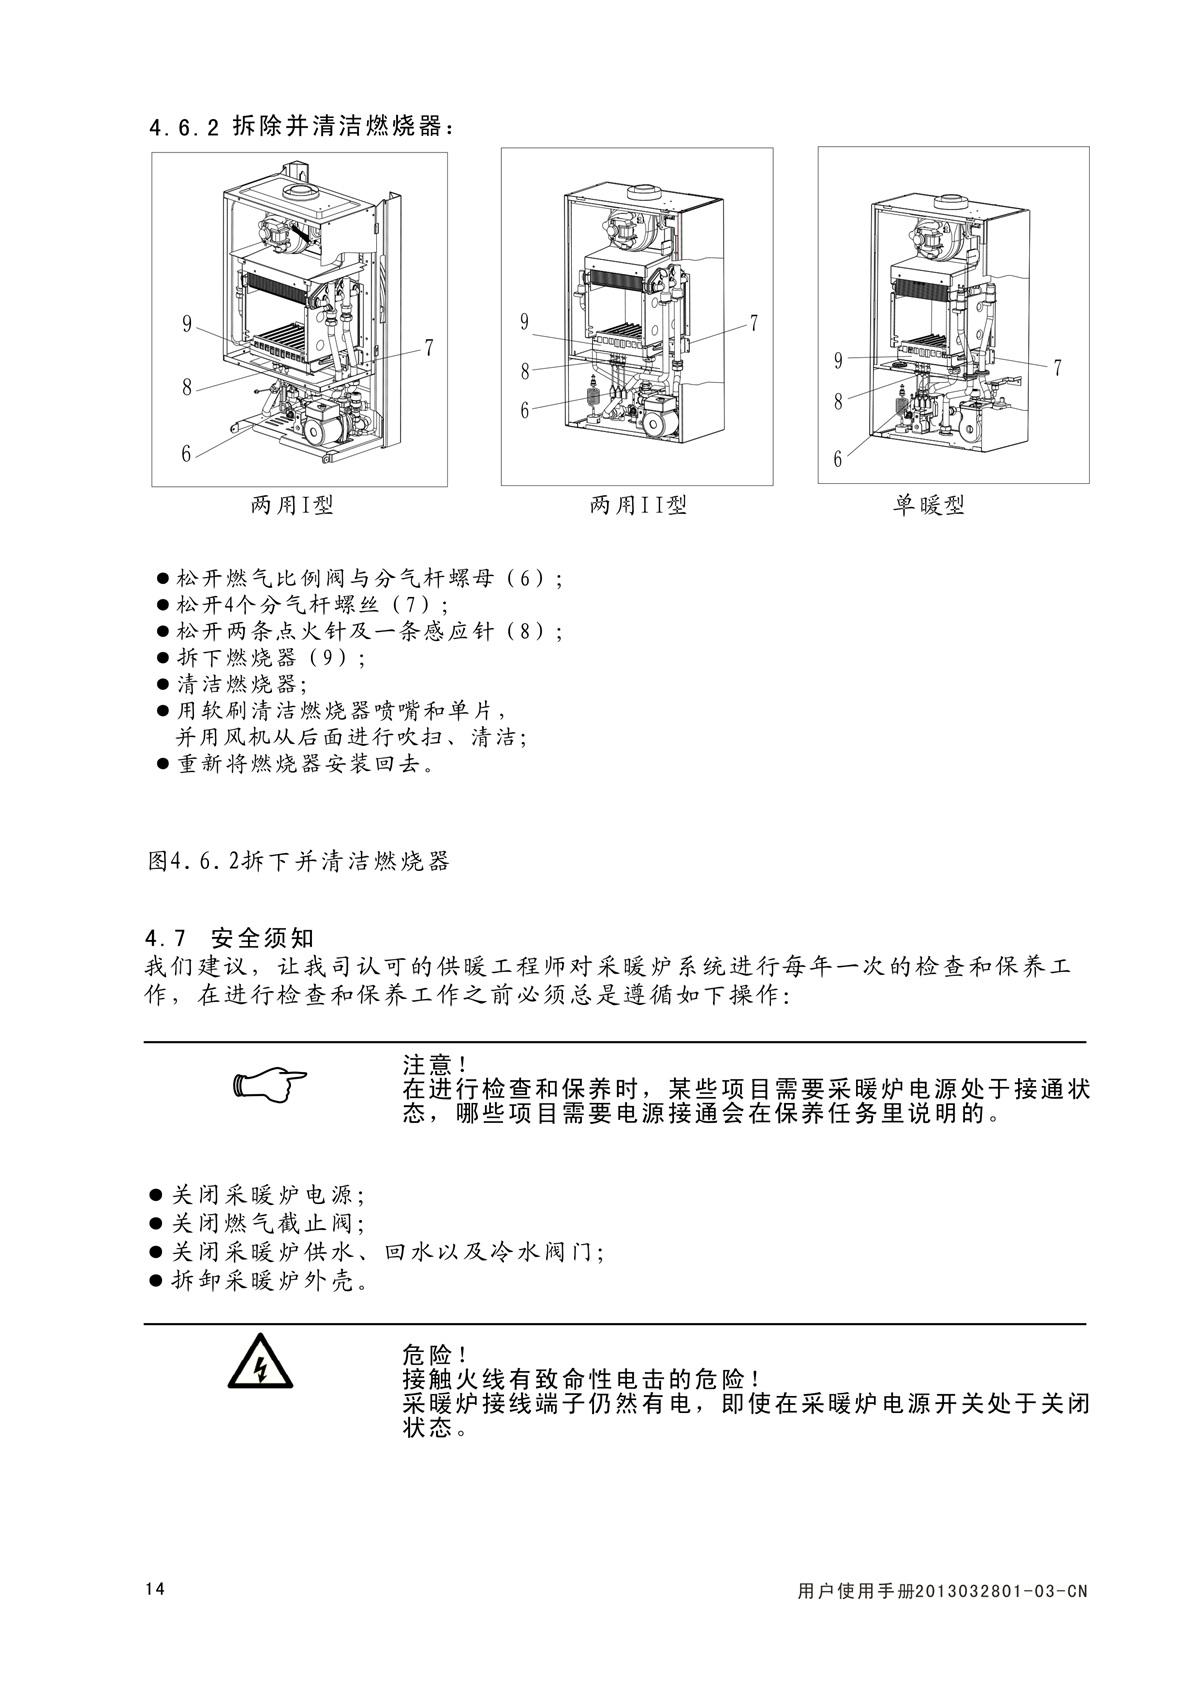 ES06系列-用户使用手册-4_01.jpg